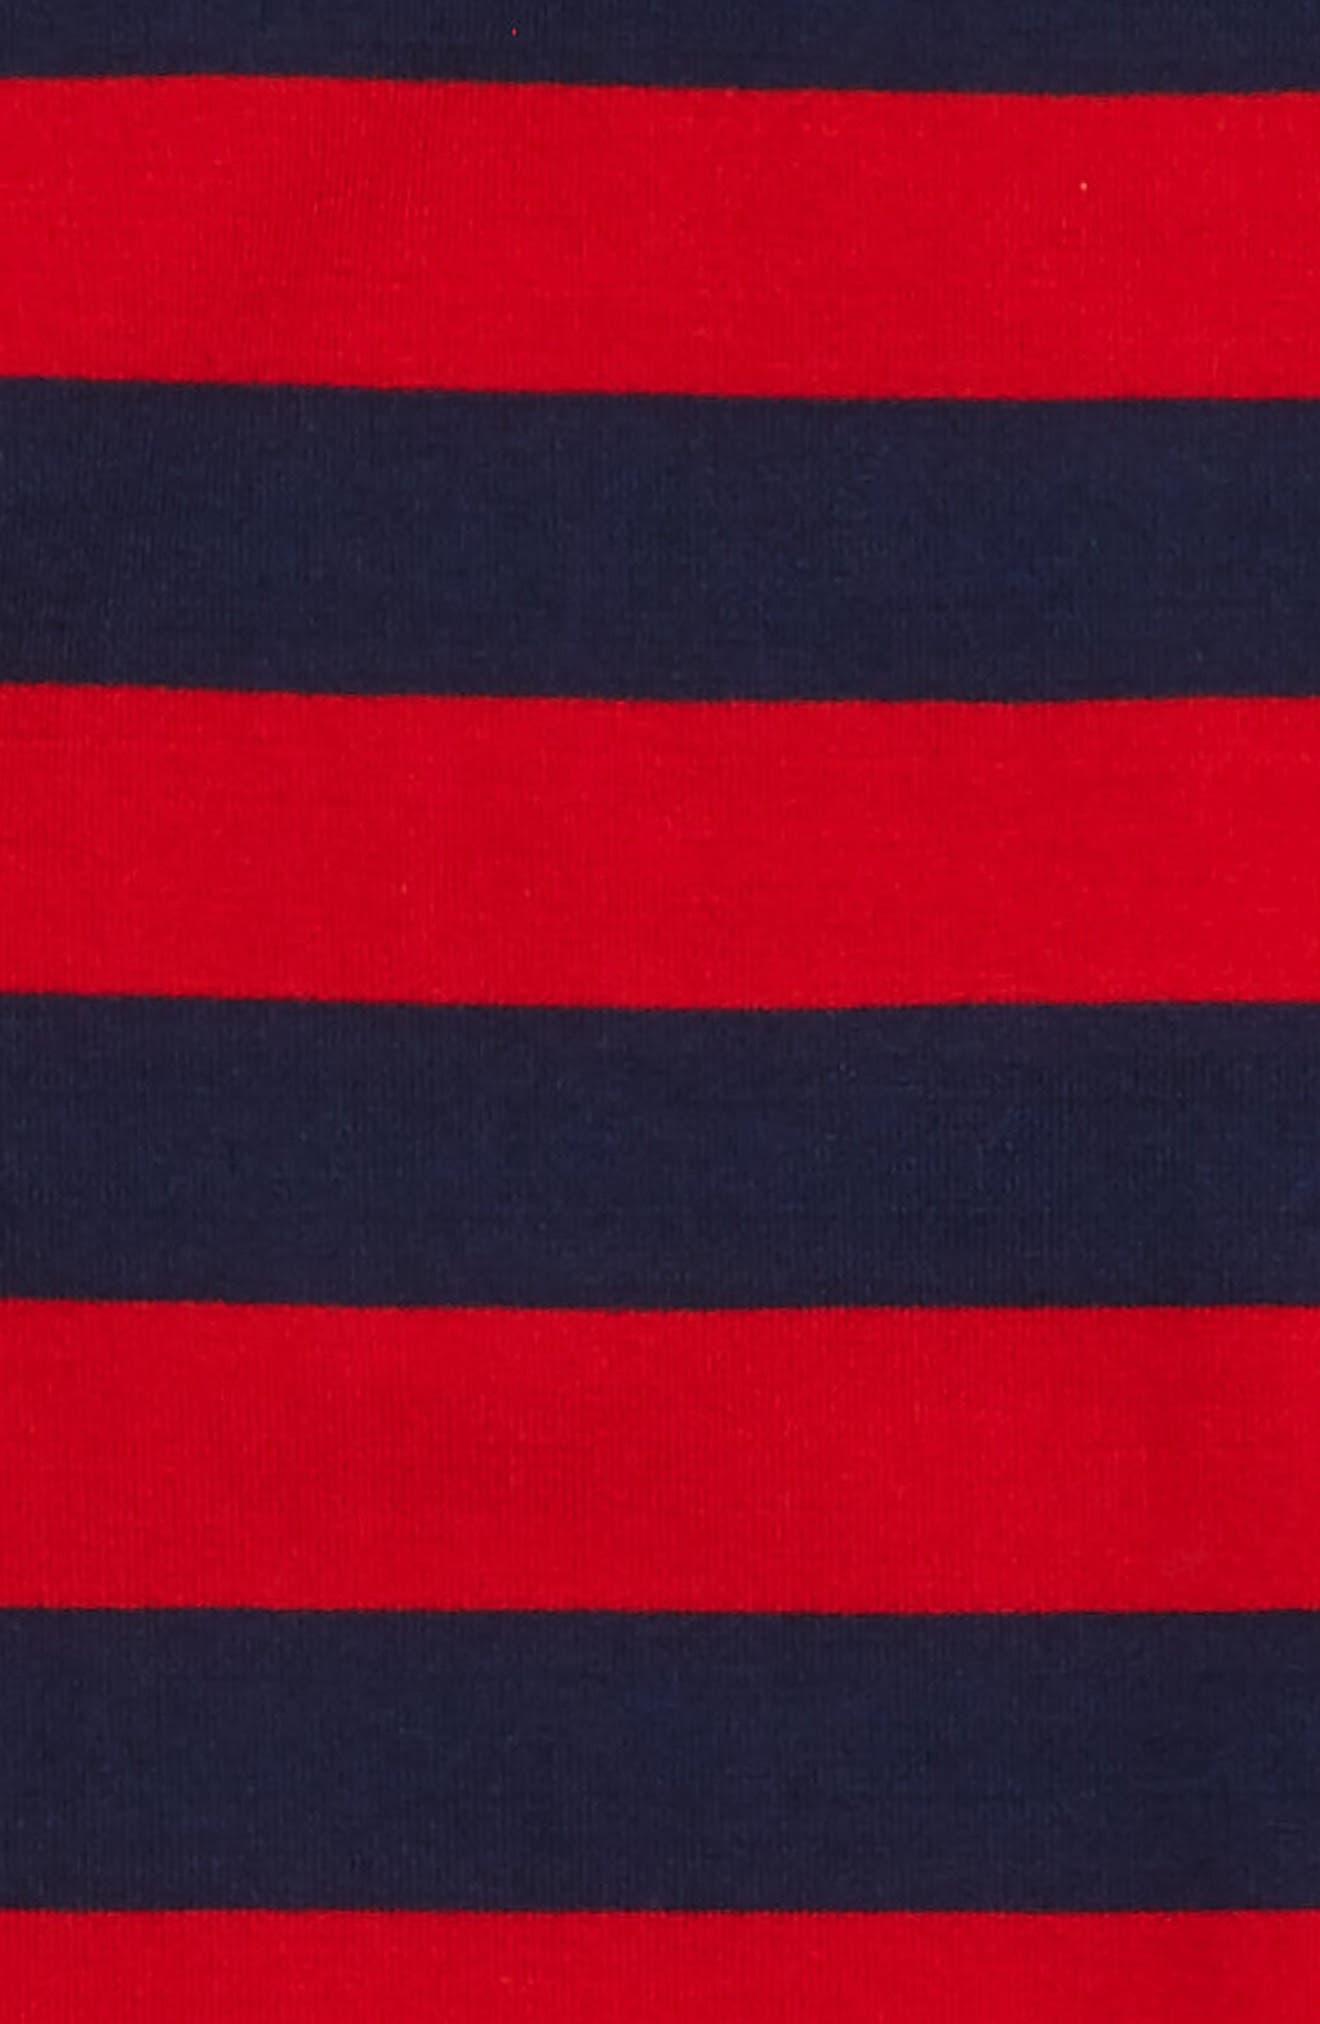 Stripe T-Shirt,                             Alternate thumbnail 2, color,                             Red